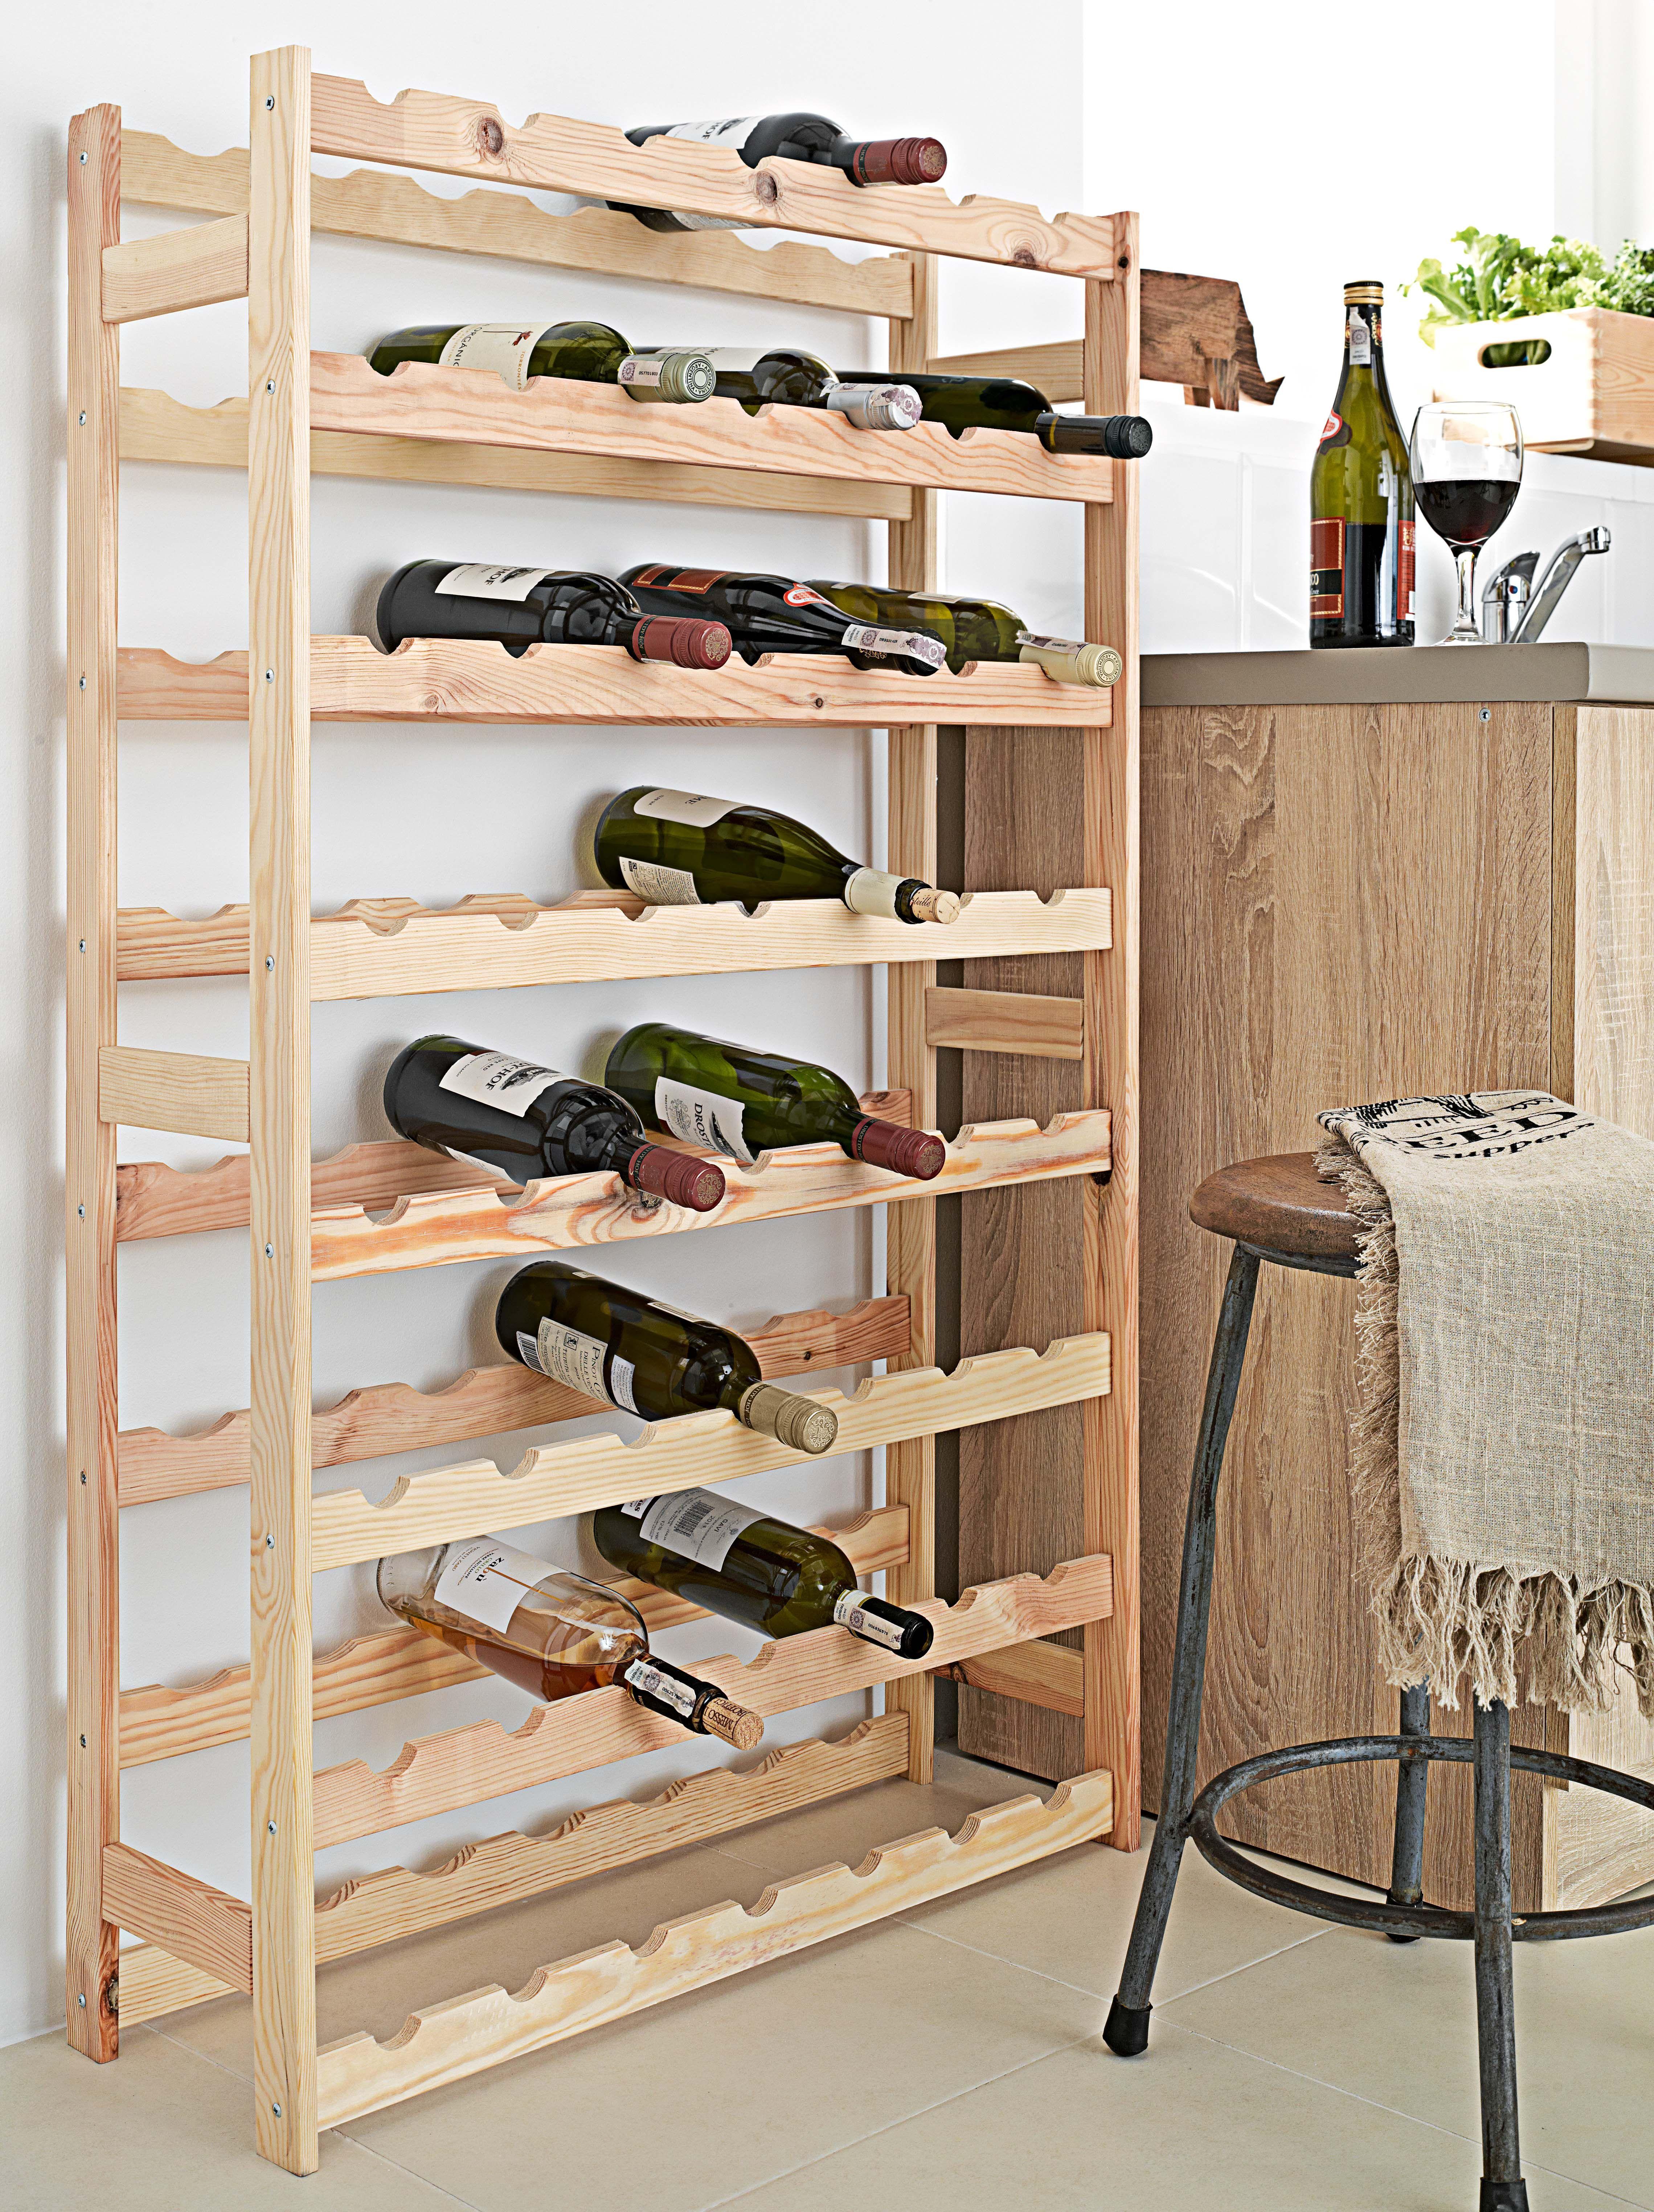 Katalog Kuchnie 2015 Diy Wood Projects Wood Diy Wood Projects